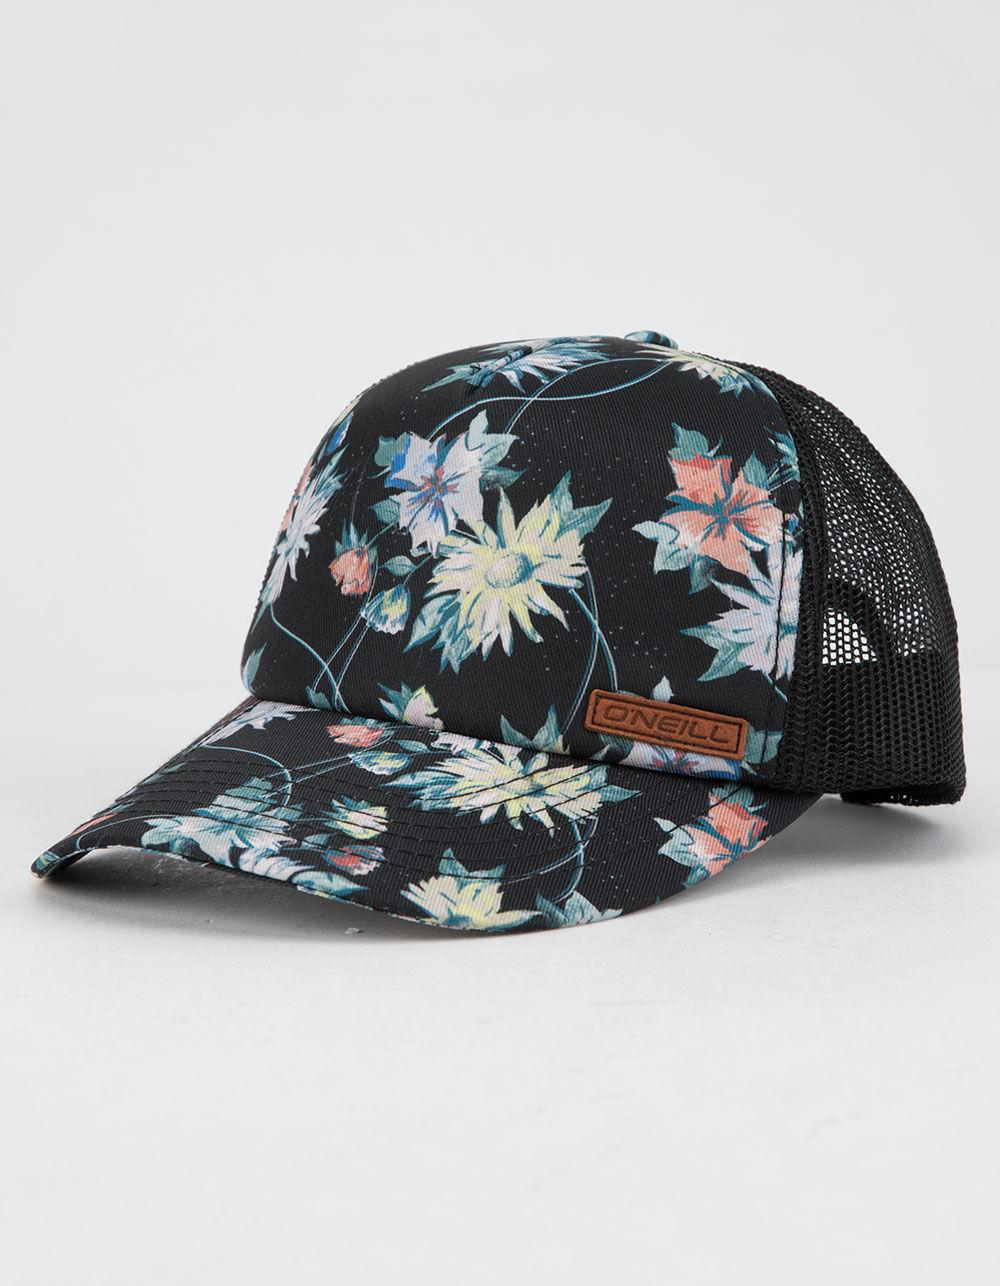 658681317cc Lyst - O neill Sportswear Saturdays Womens Trucker Hat in Black